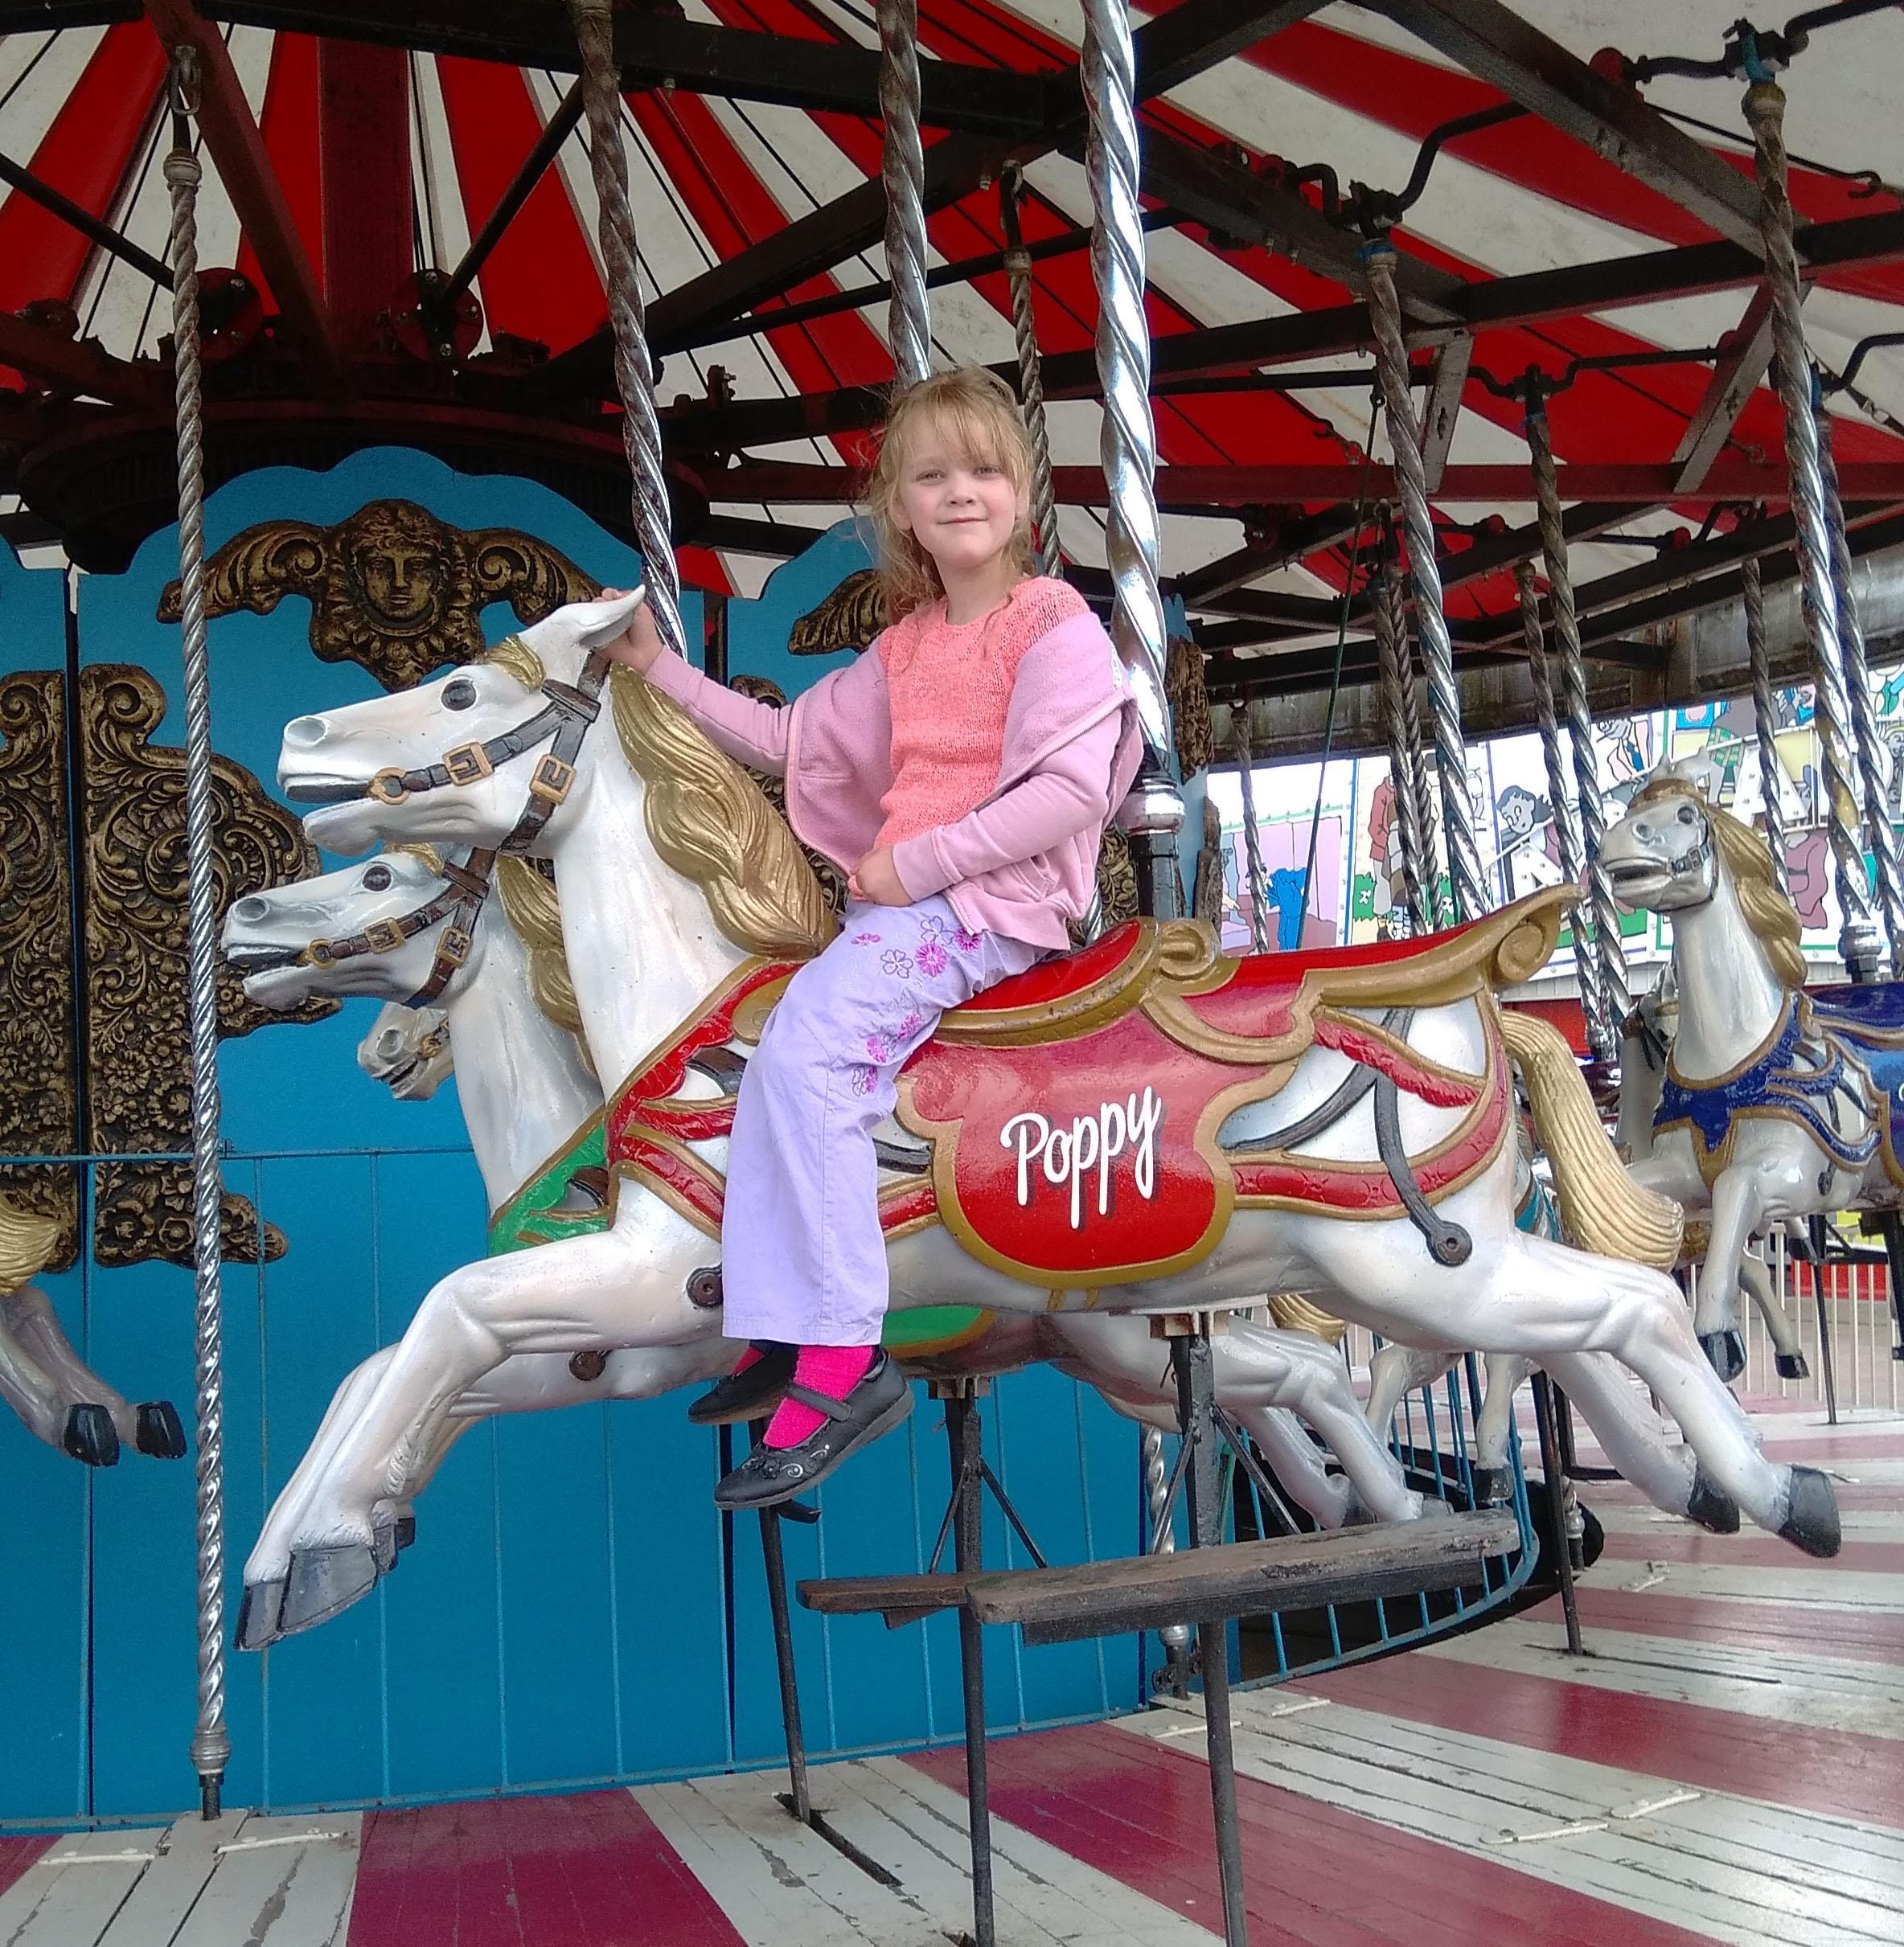 flamingo land theme park yorkshire (10)